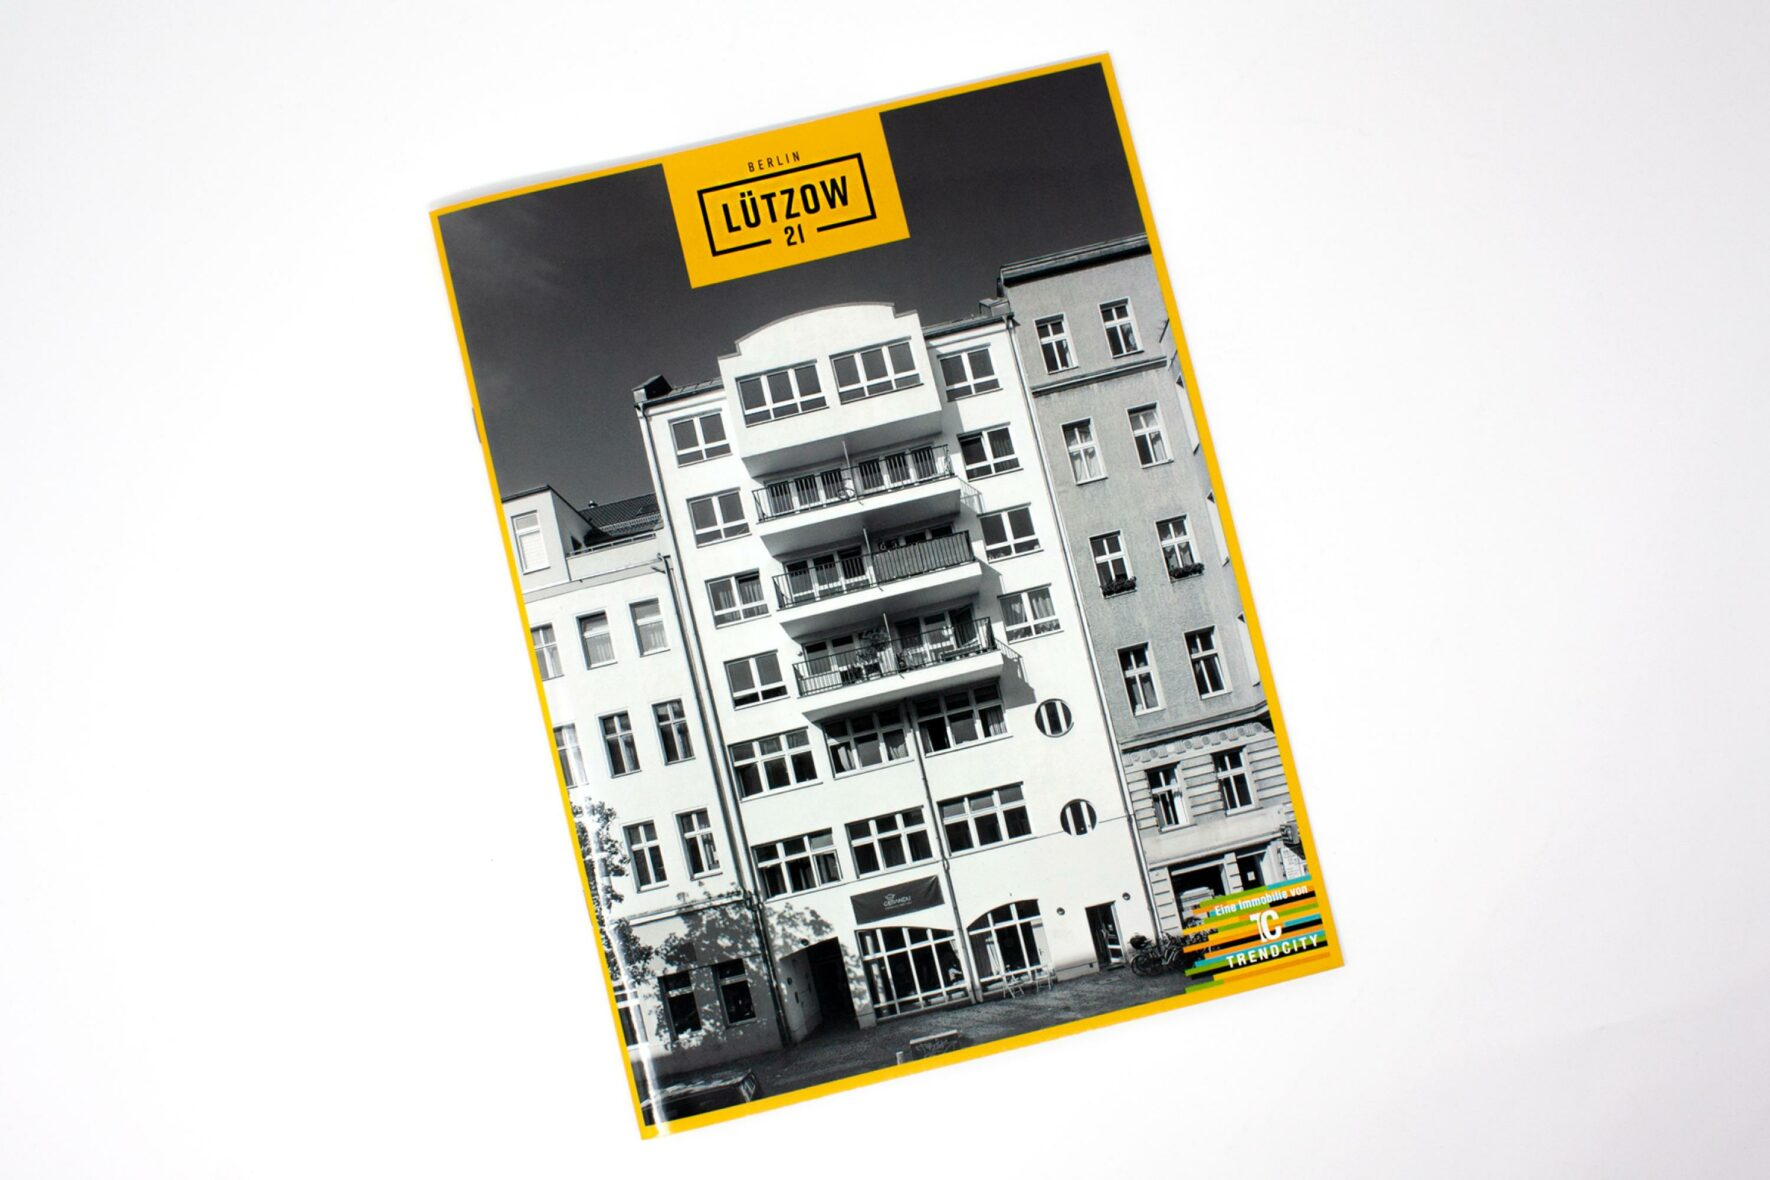 Immobilienbranding-Luetzow-Trendcity-Broschüre-FORMLOS-berlin-Print_MG_8320